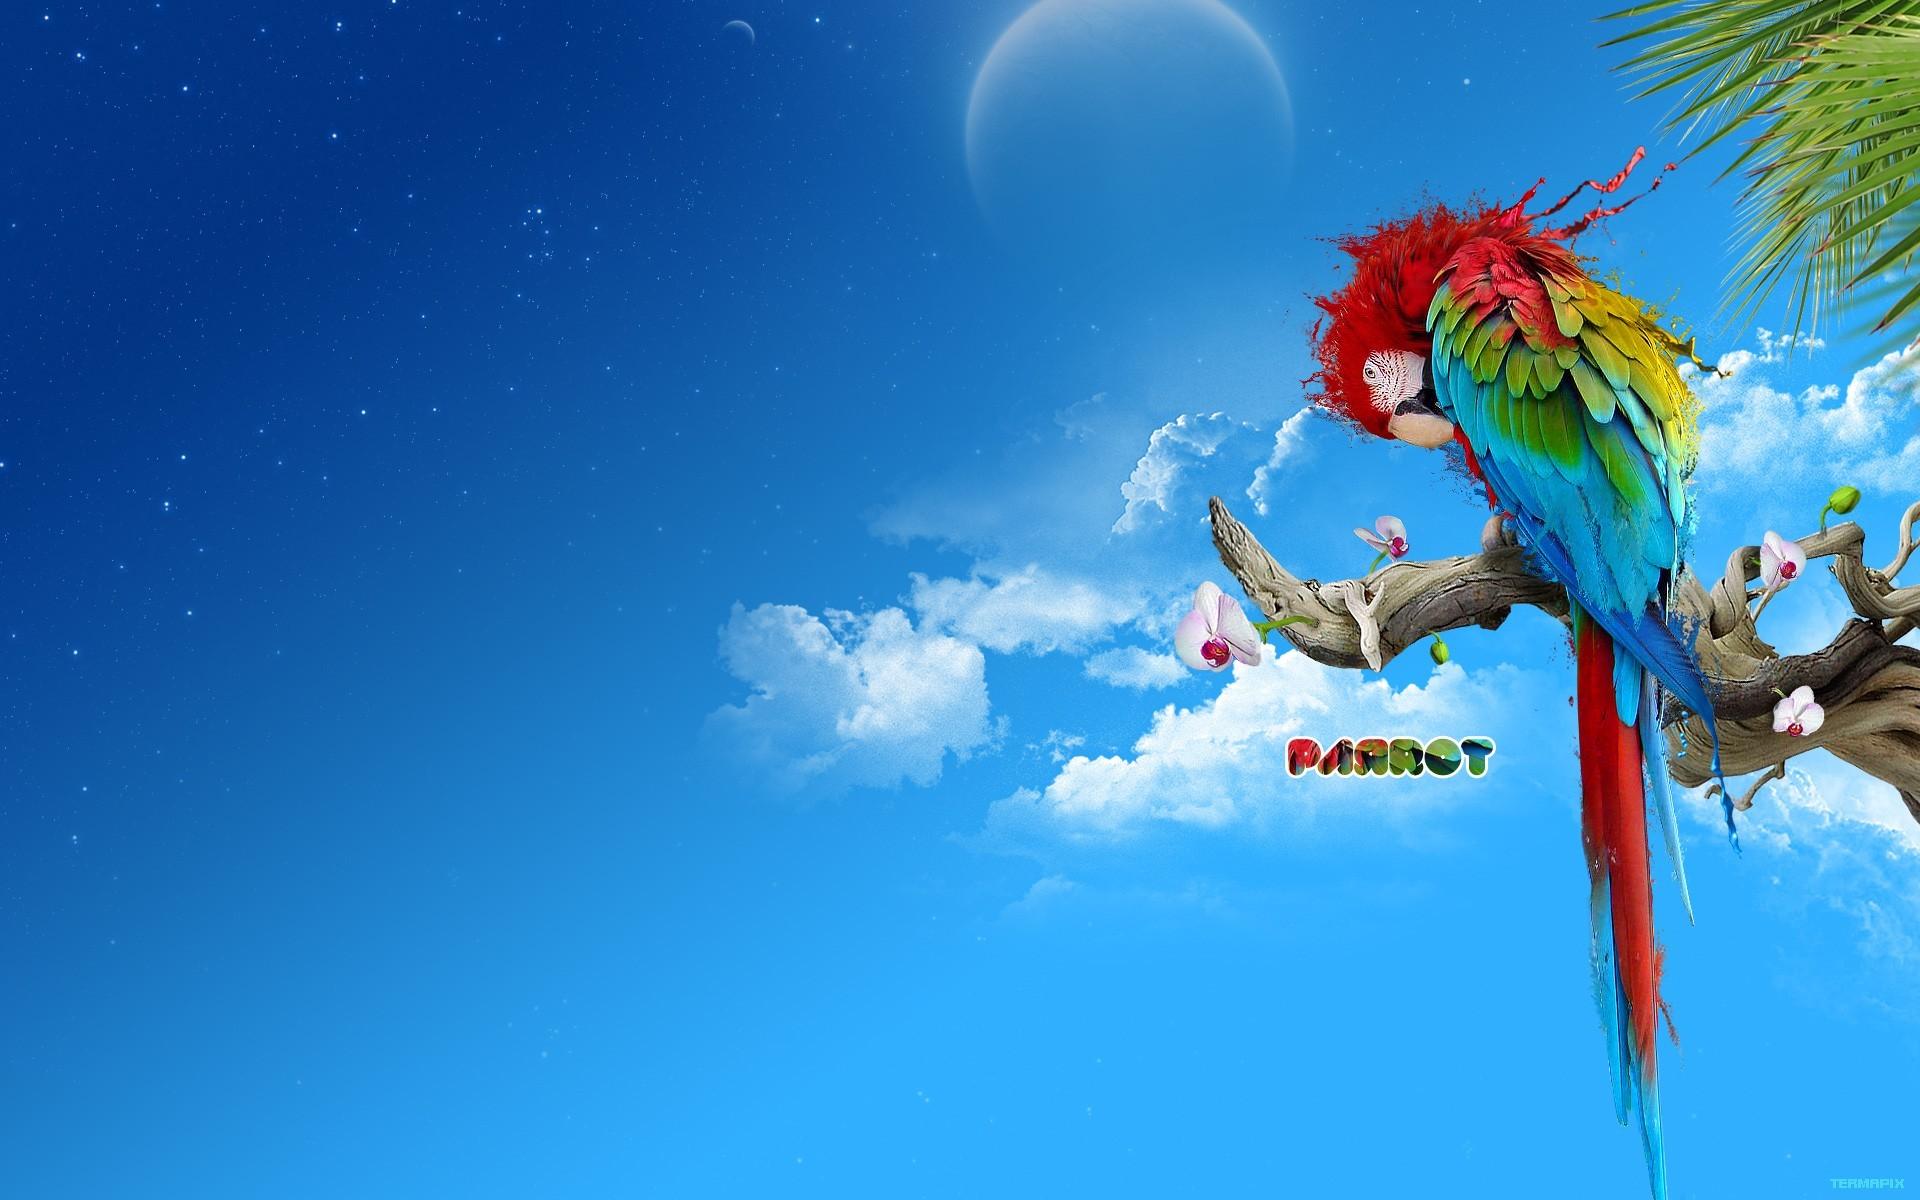 parrot hd 1080p desktop wallpaper 0019